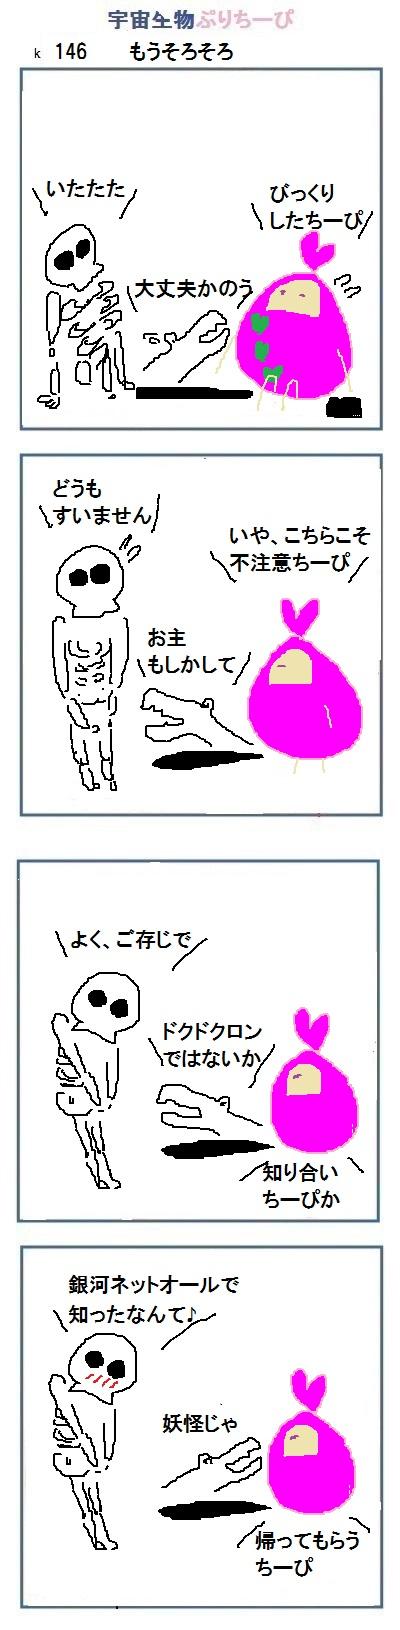 161029_k146.jpg